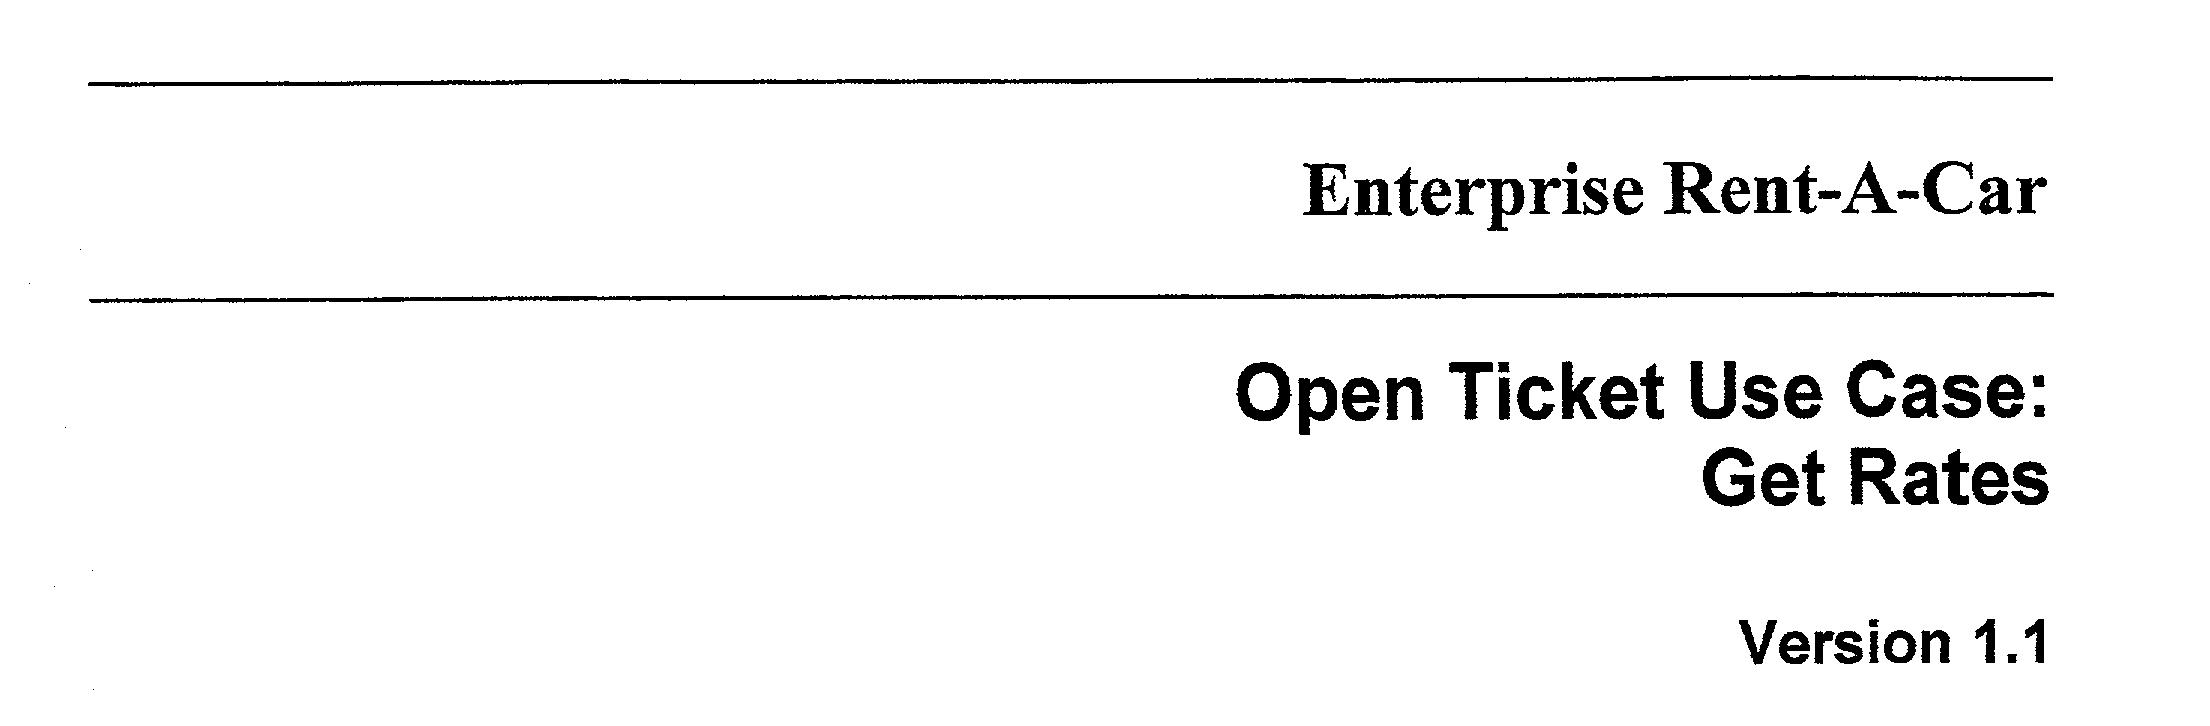 Figure US20030125992A1-20030703-P01662